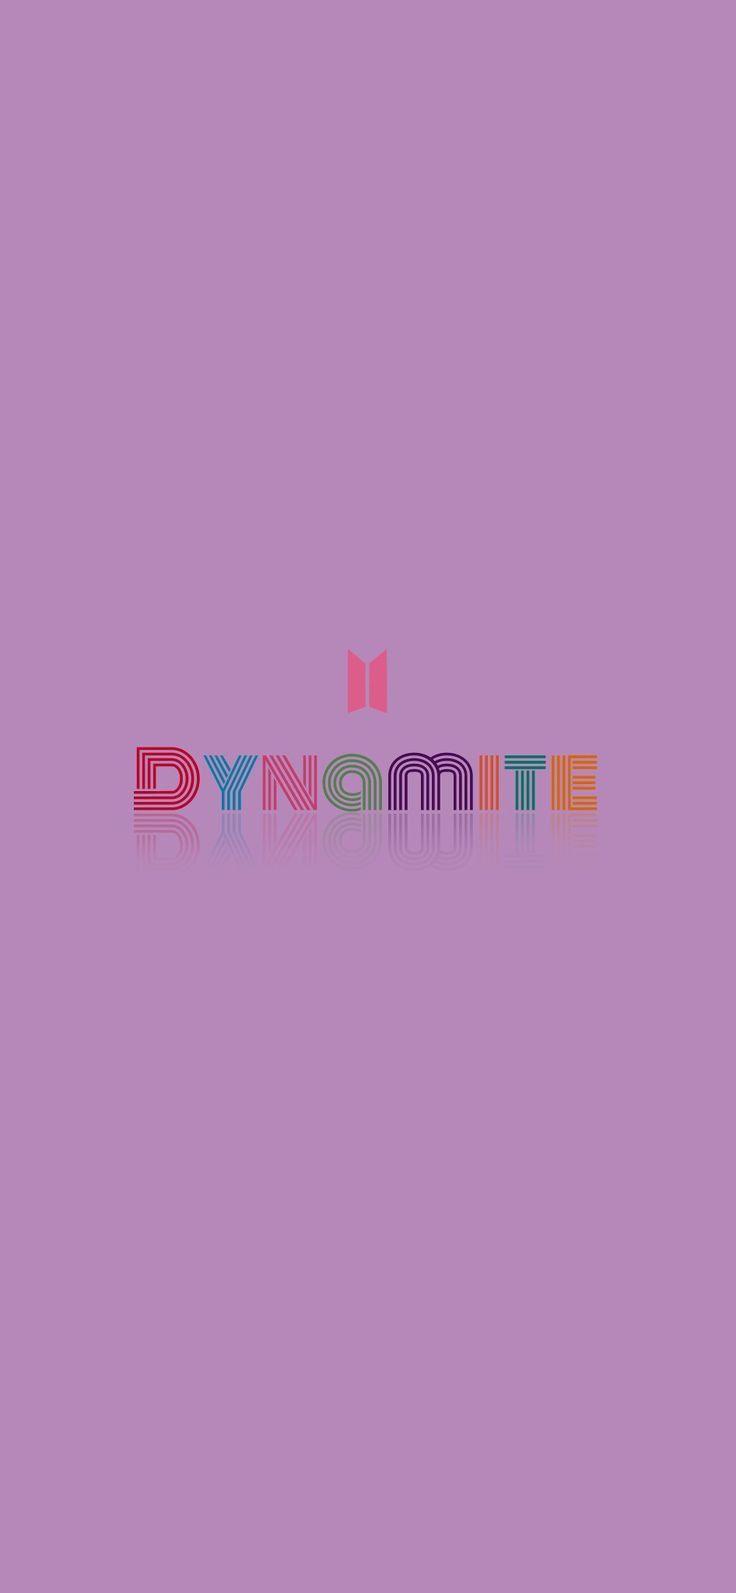 Dynamite Wallpaper Bts Wallpaper Wallpaper Bts